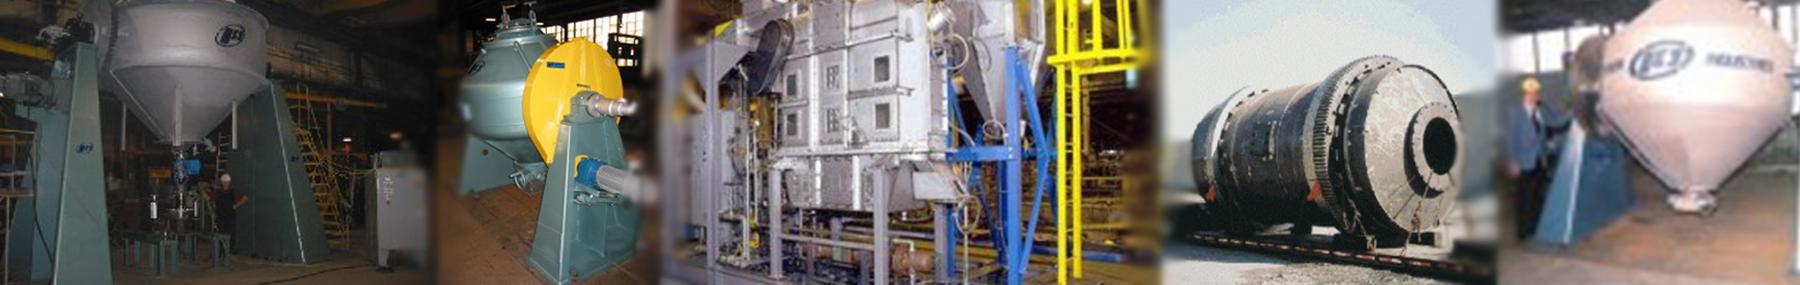 Industrial Dryers